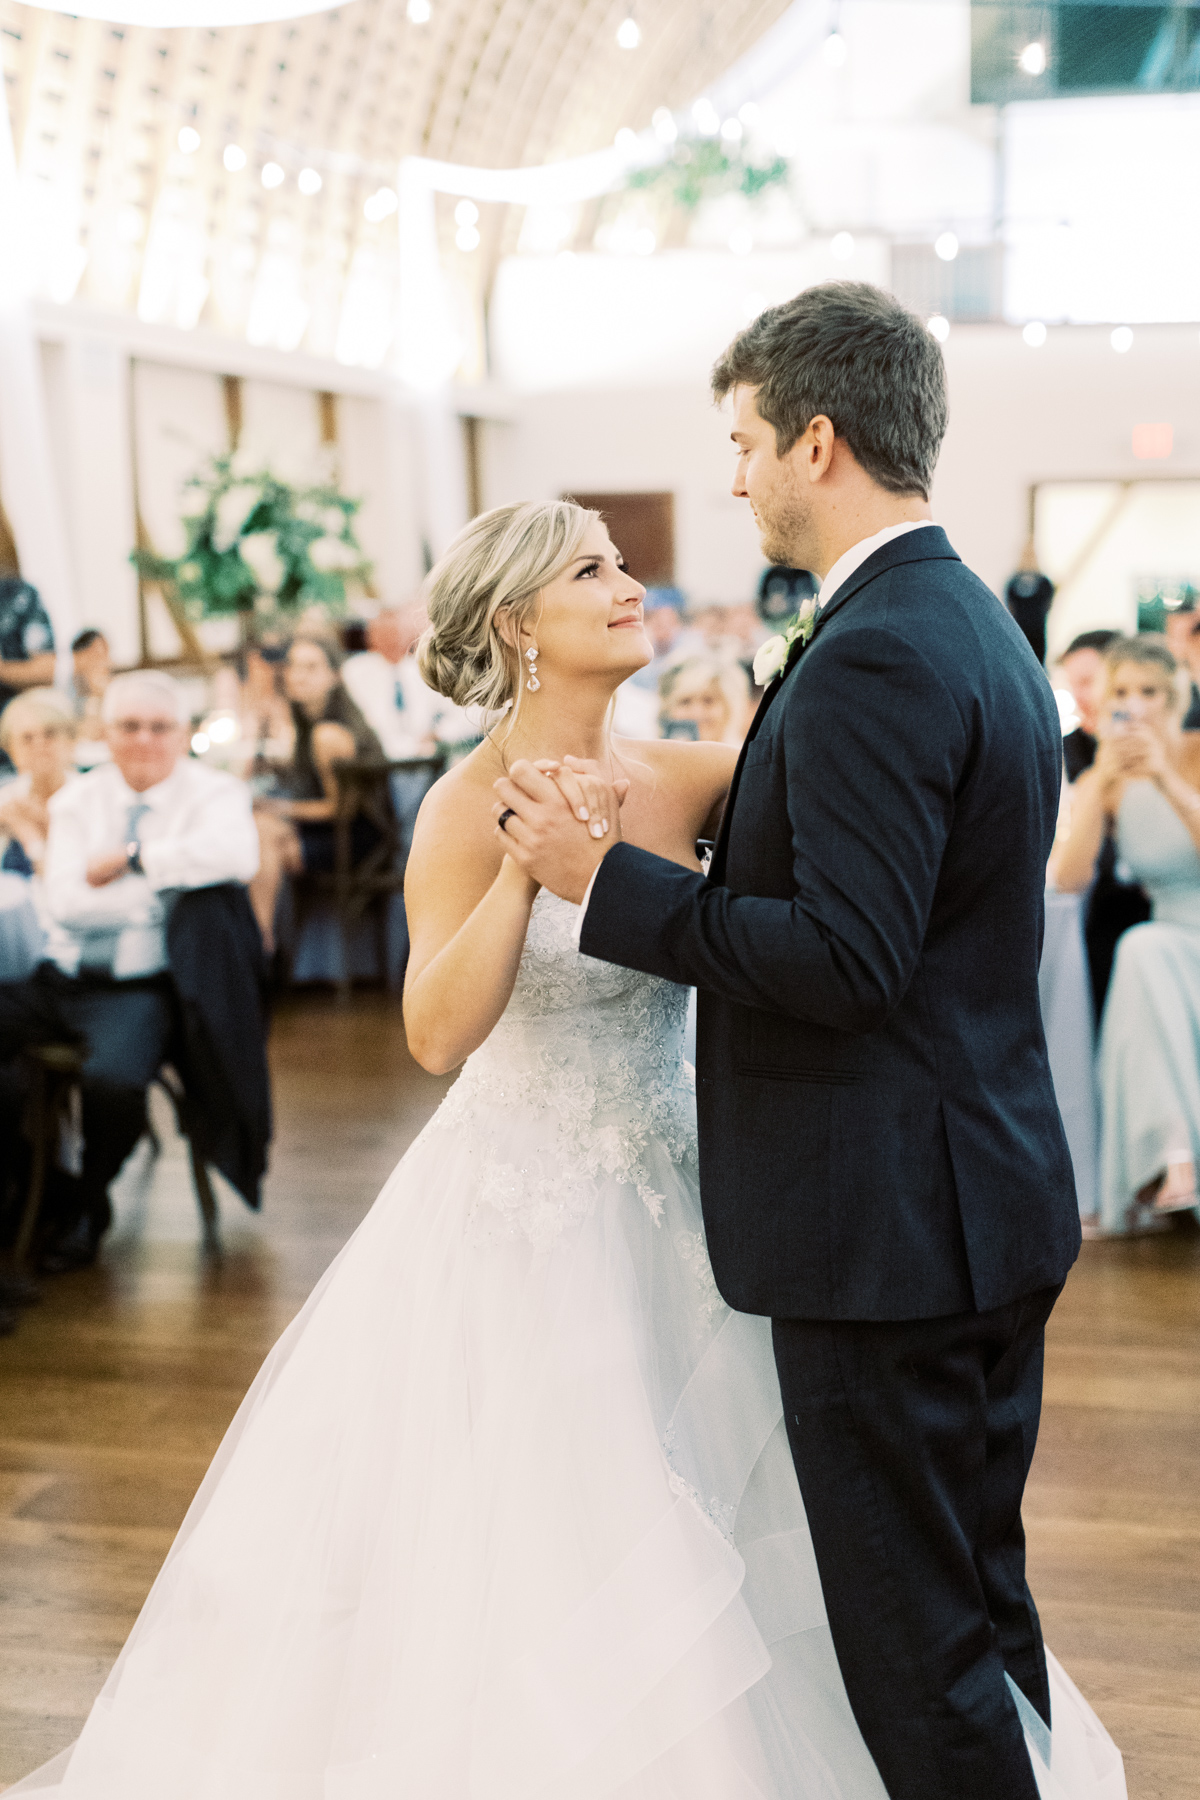 winmock-kinderton-wedding-074.jpg